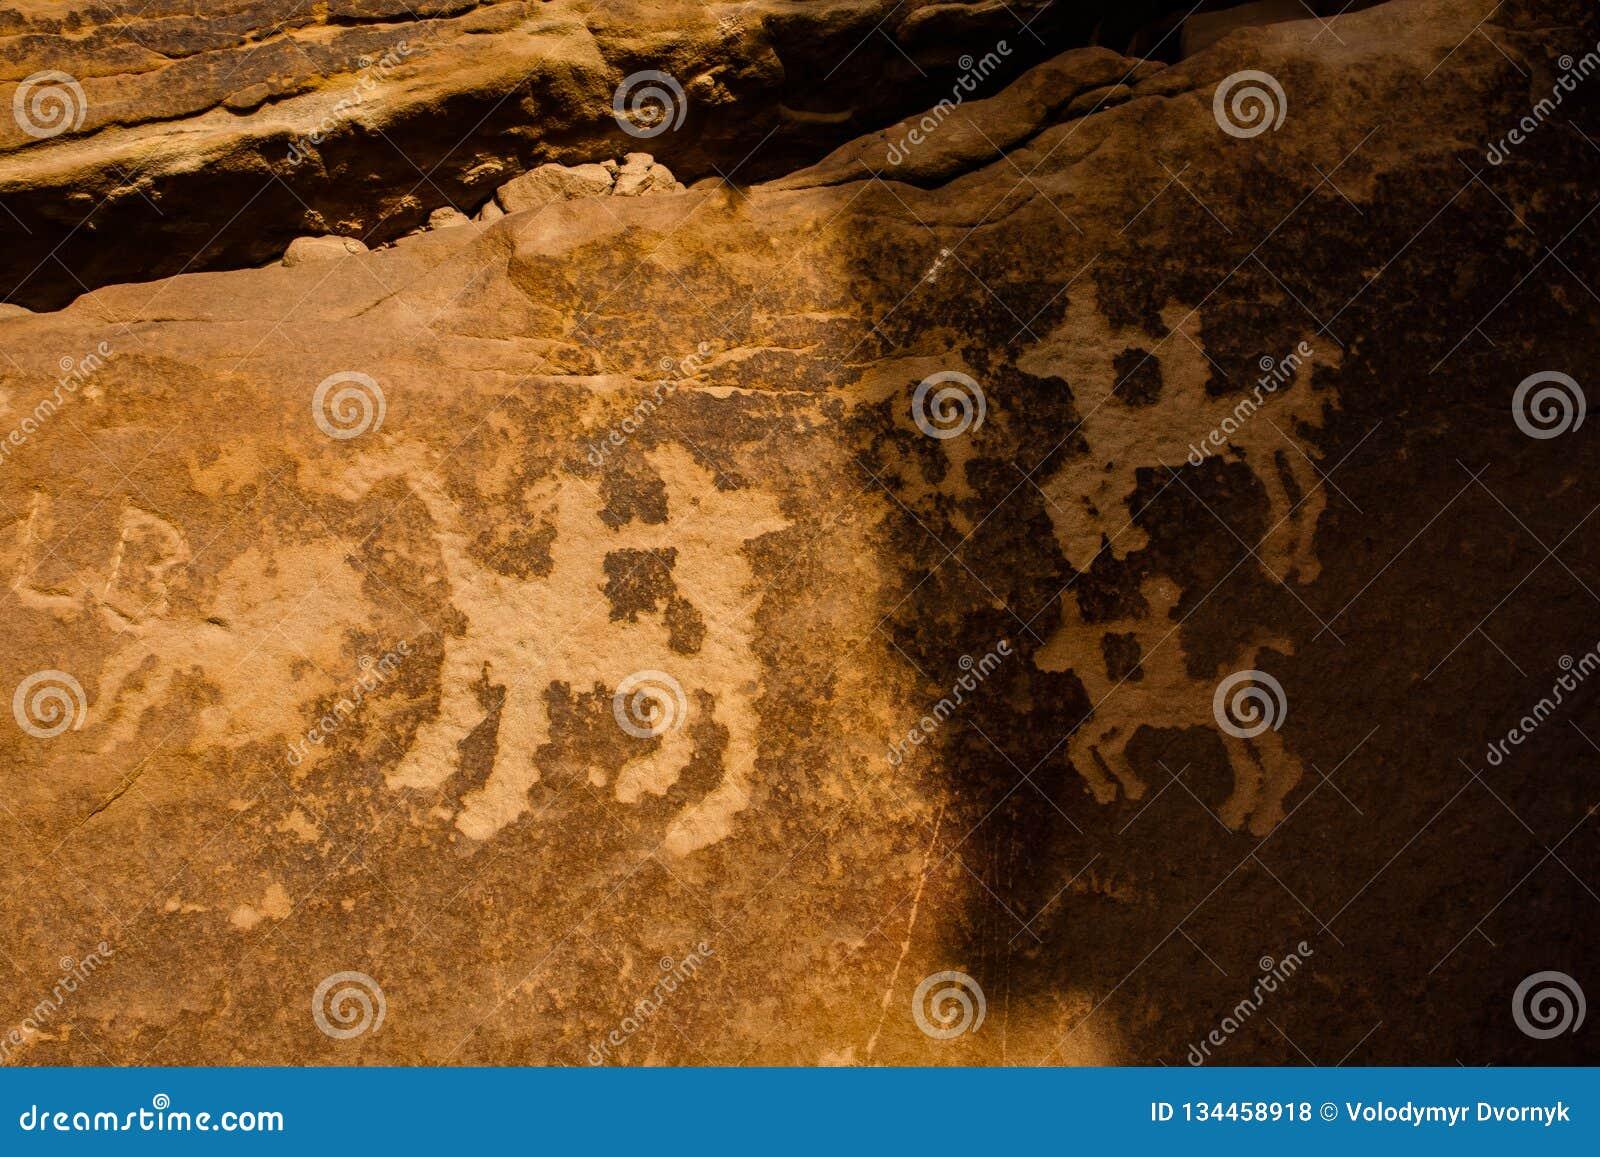 Musayqirah Petroglyphs, Riyadh Province, Saudi Arabia